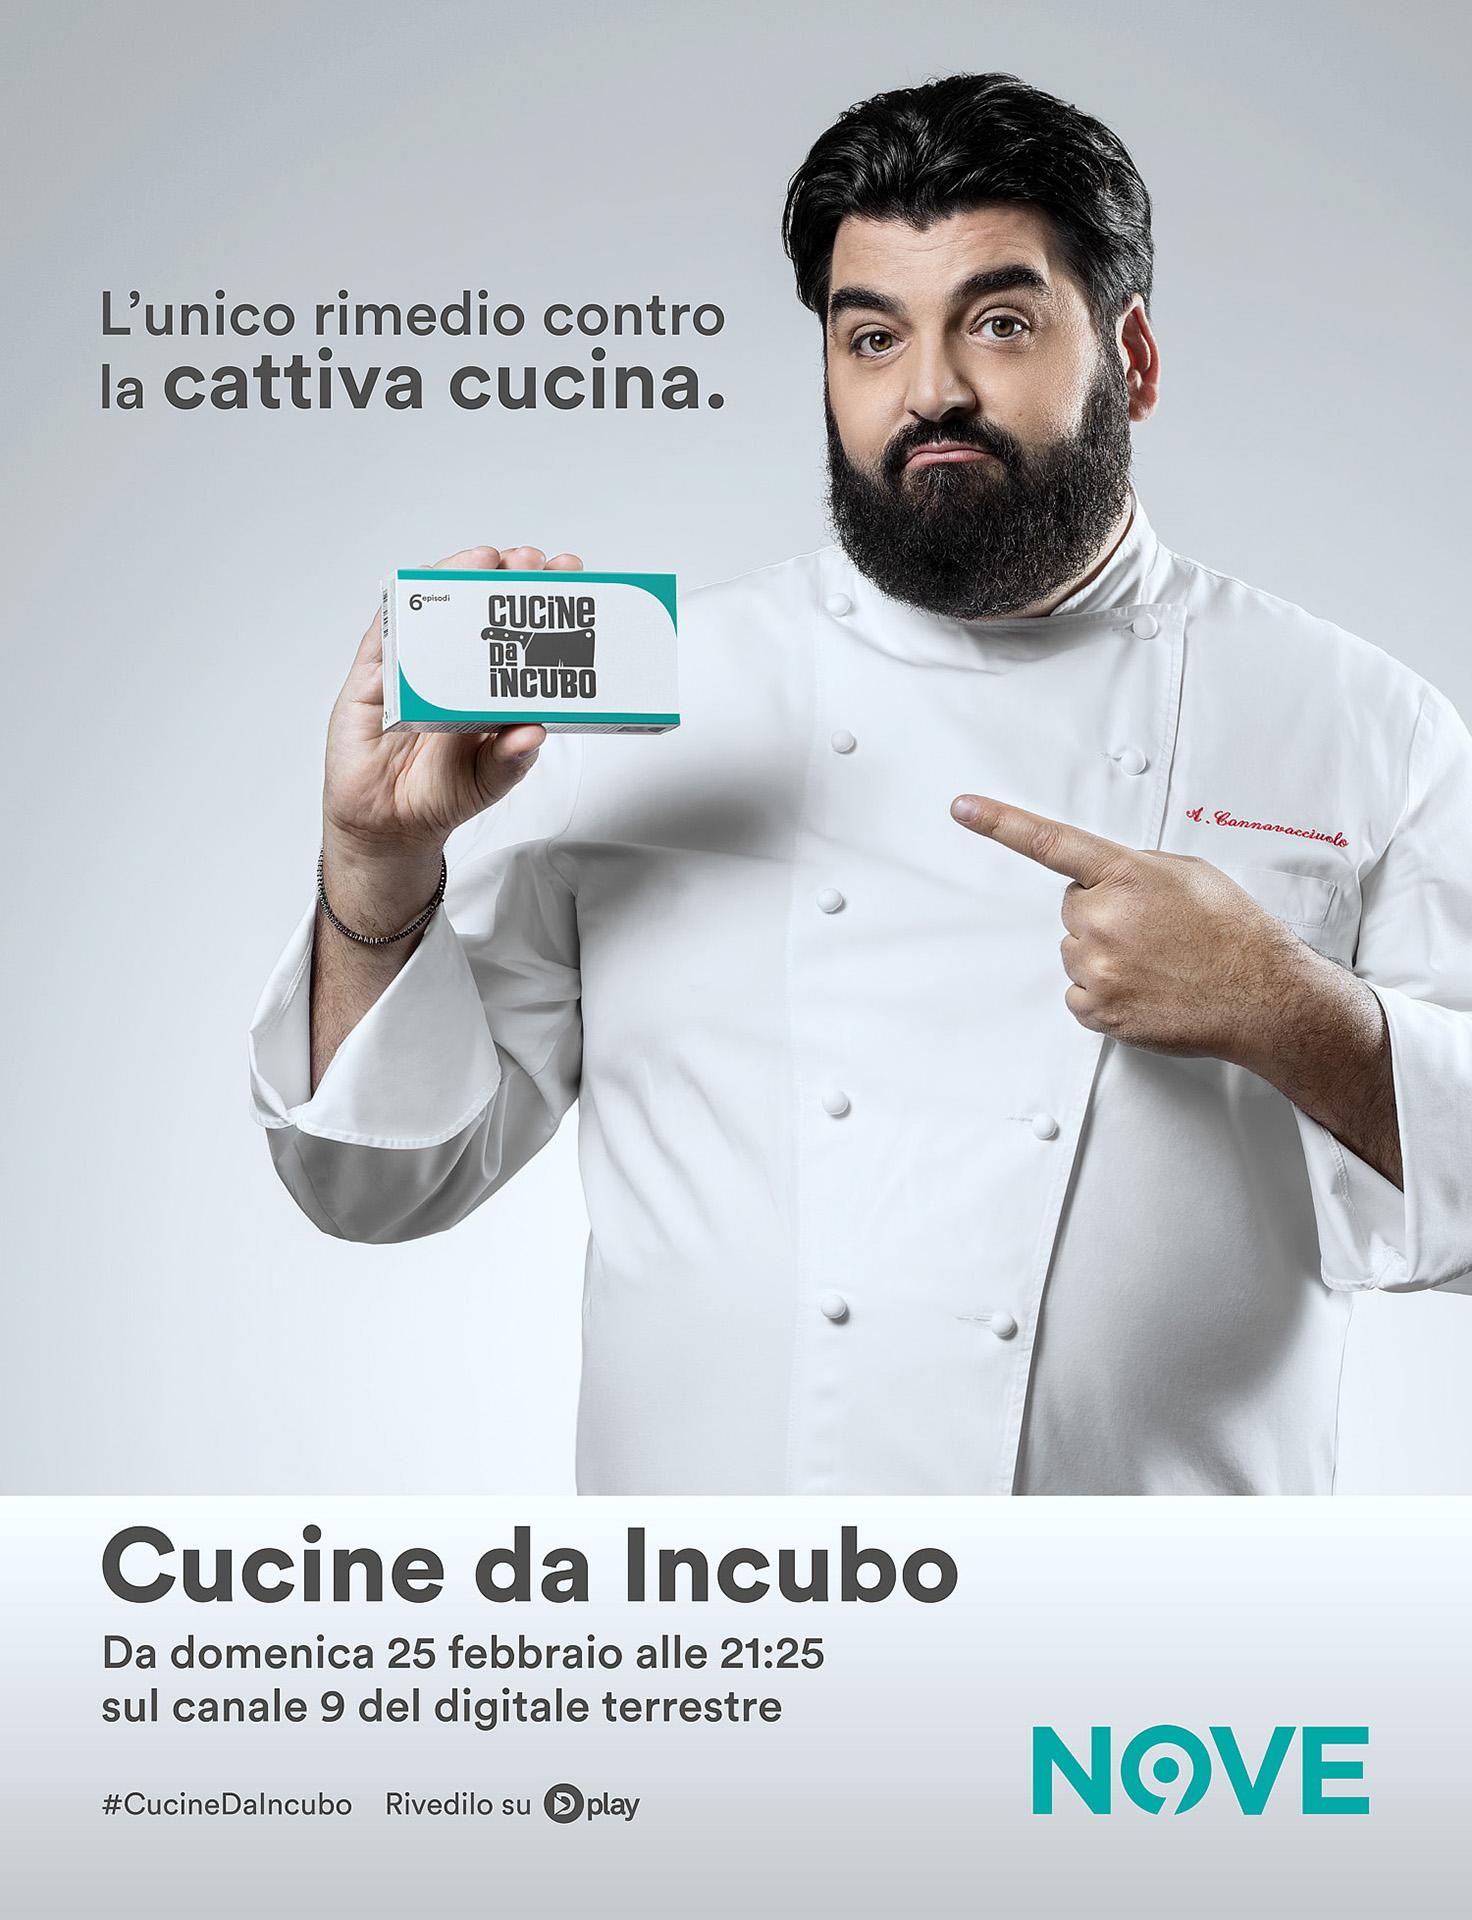 Cucina Da Incubo Photography Advertising